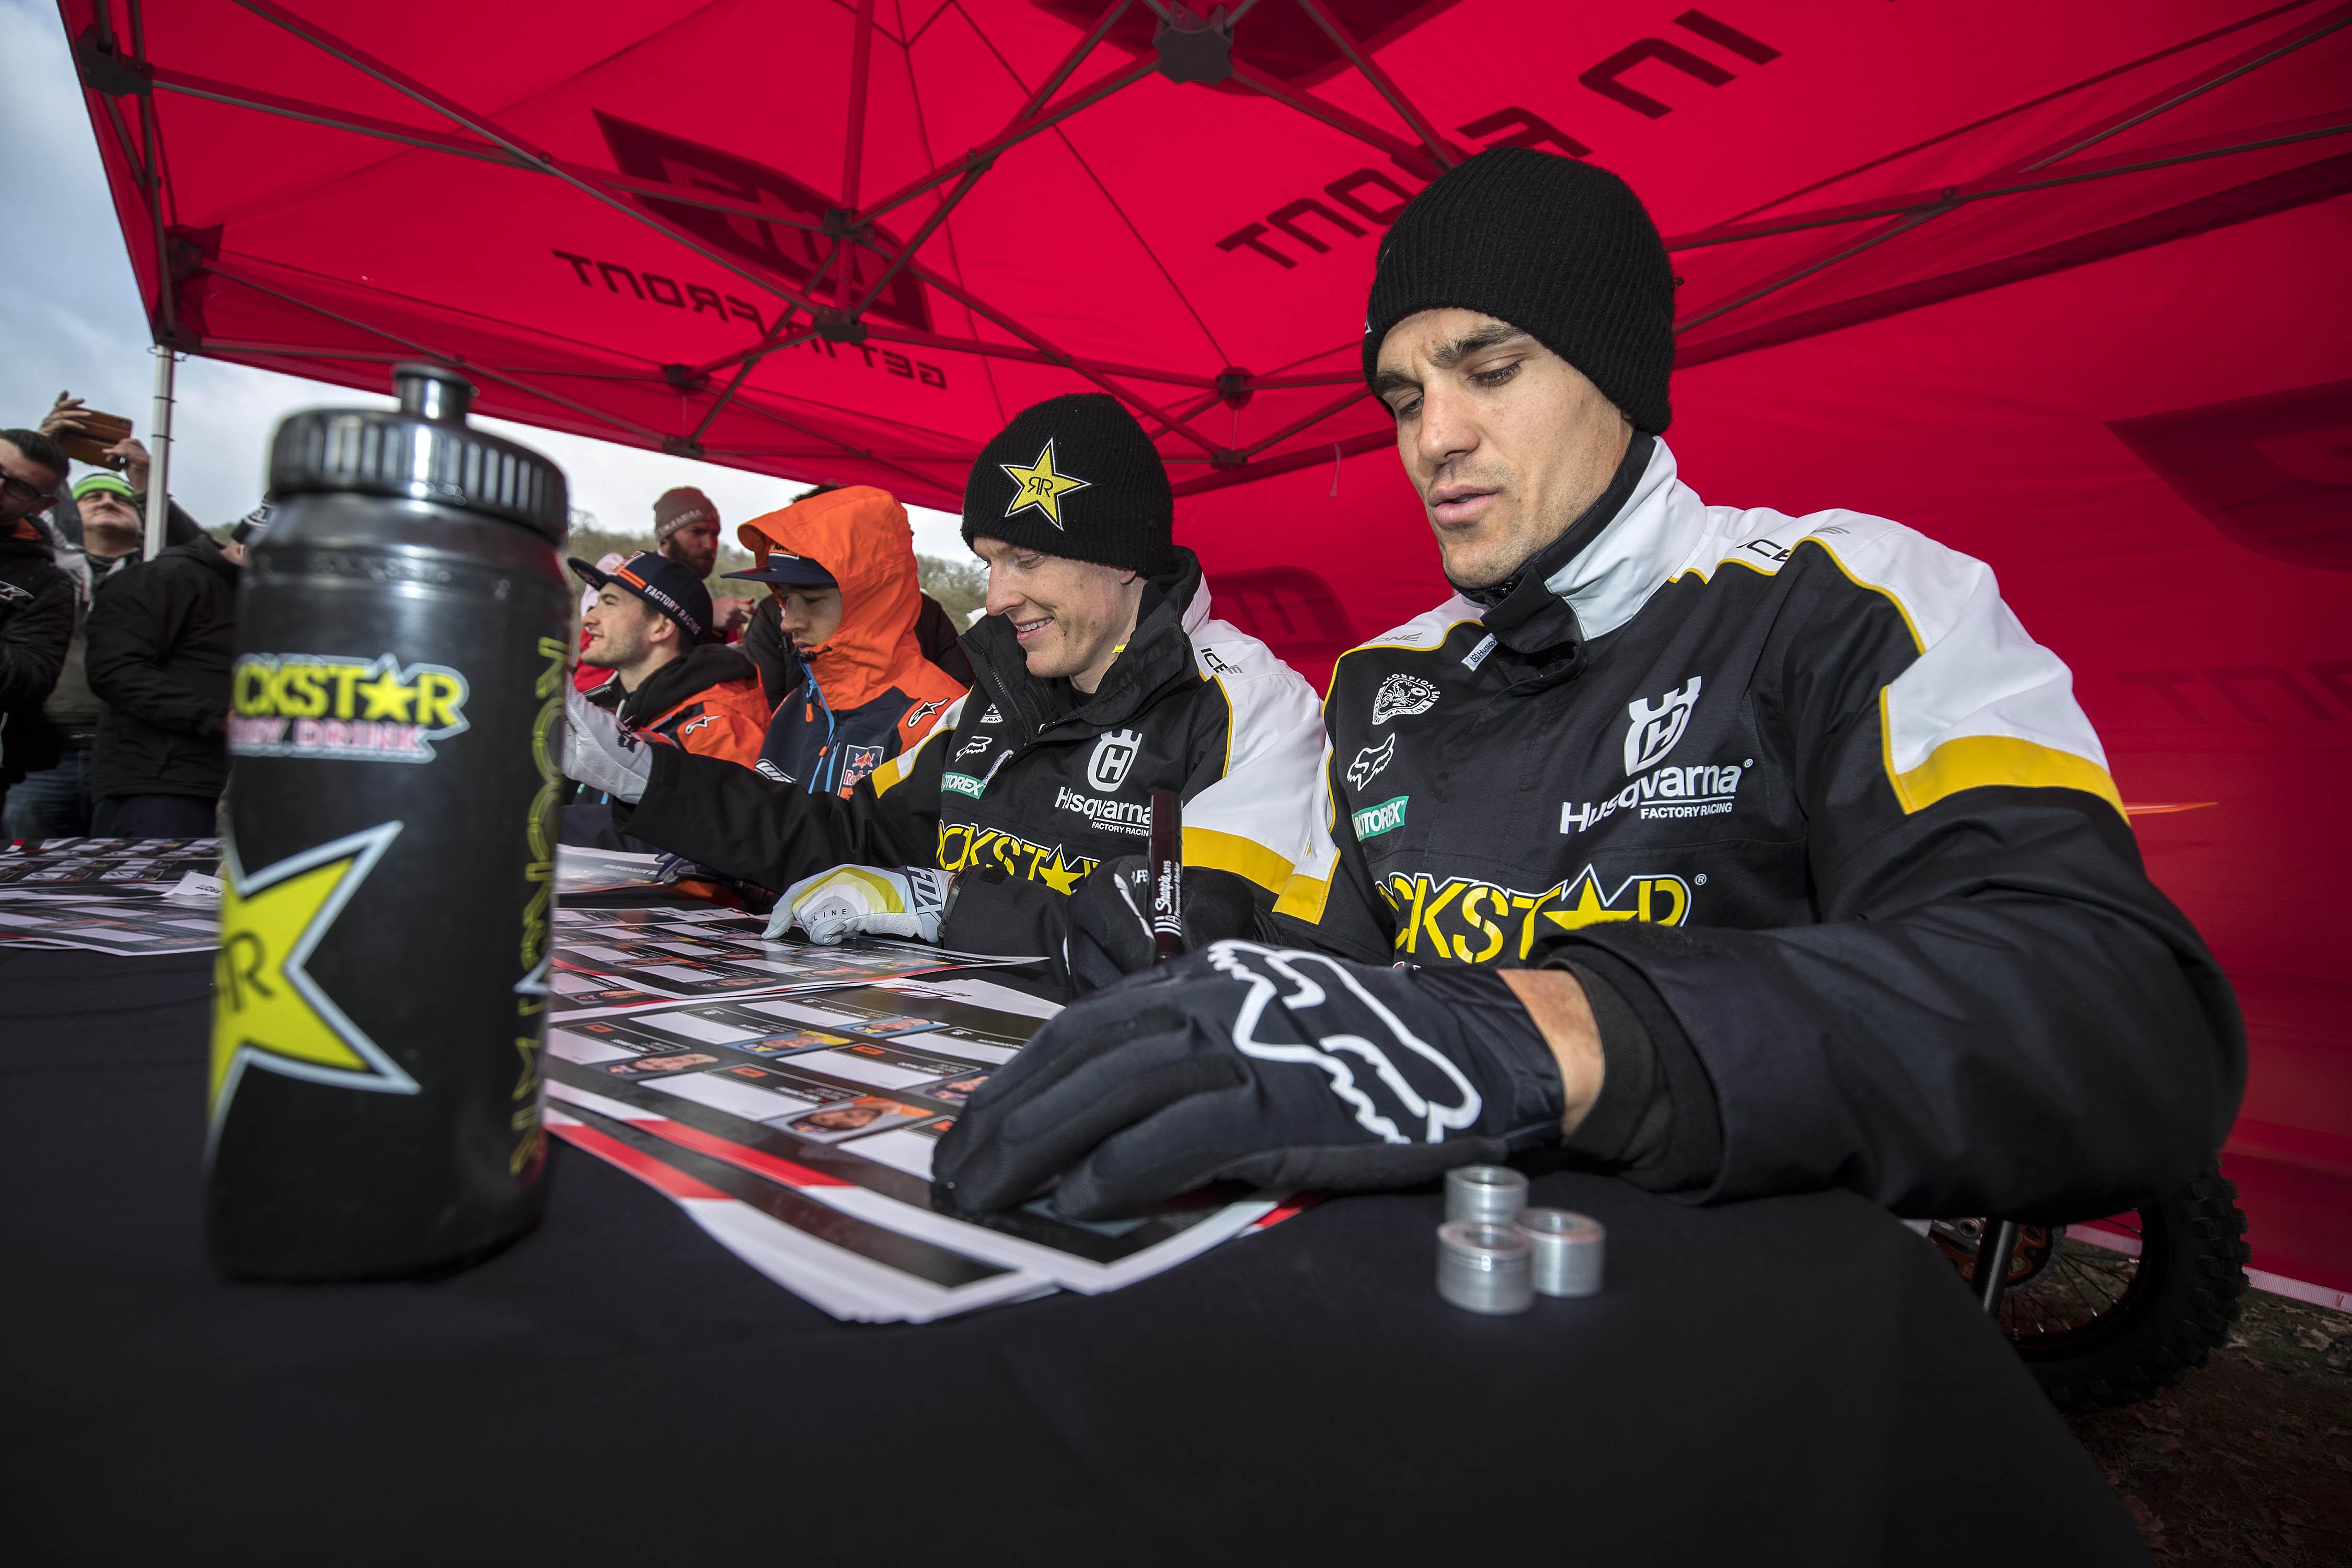 Max Anstie & Gautier Paulin - Rockstar Energy Husqvarna Factory Racing - Hawkstone